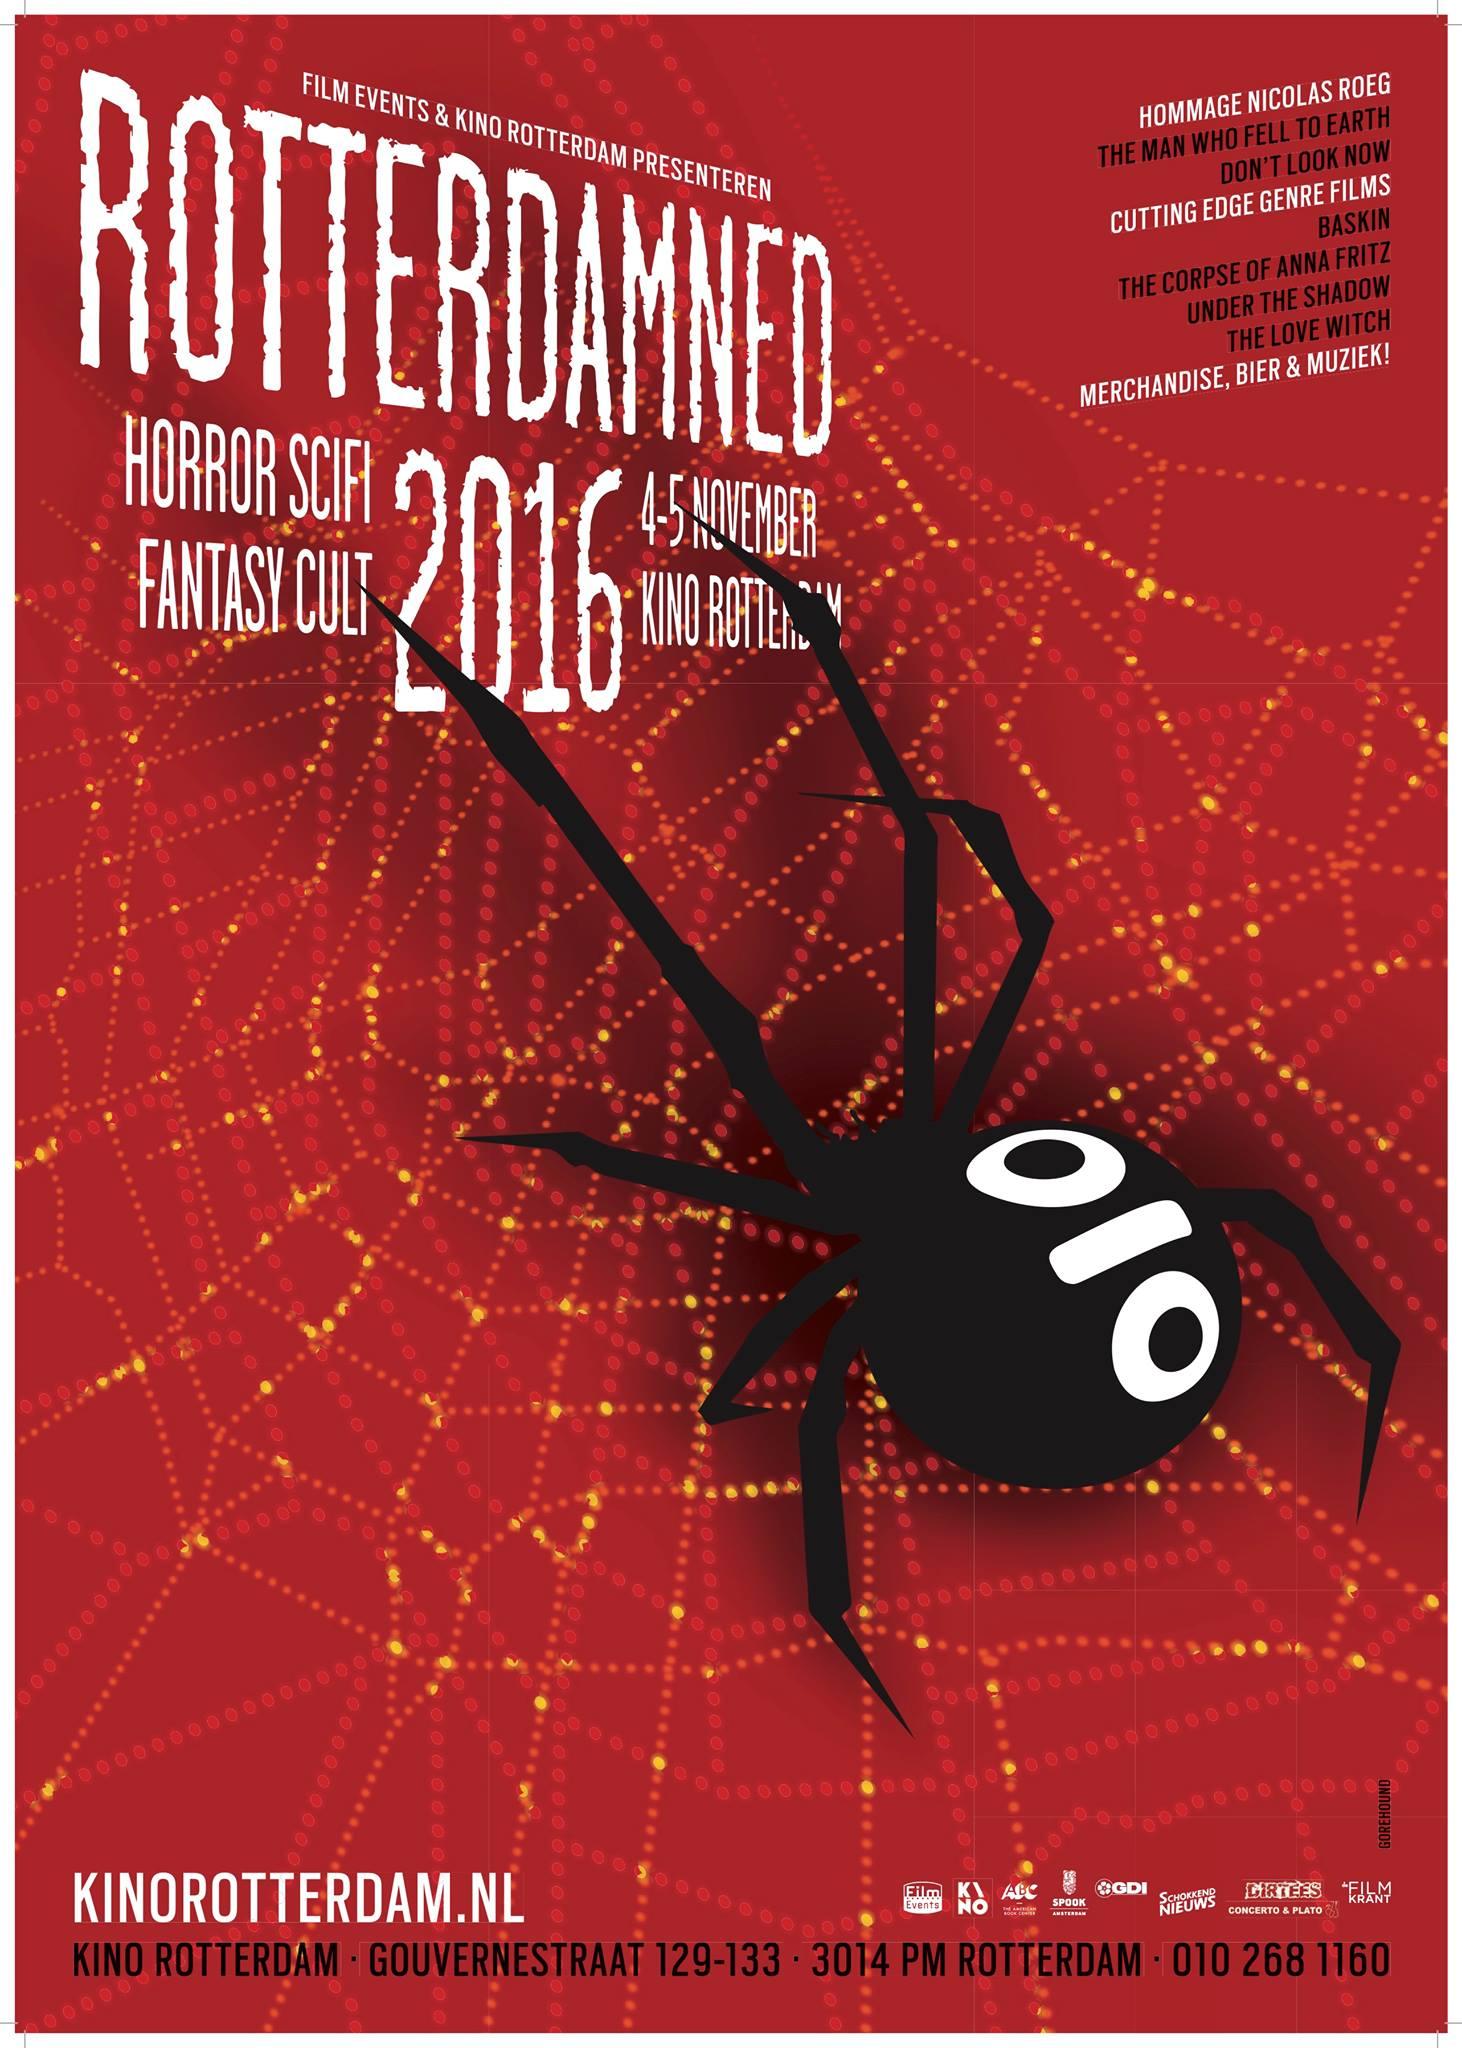 Rotterdamned 4 en 5 november 2016 kino rotterdam for Rotterdam film